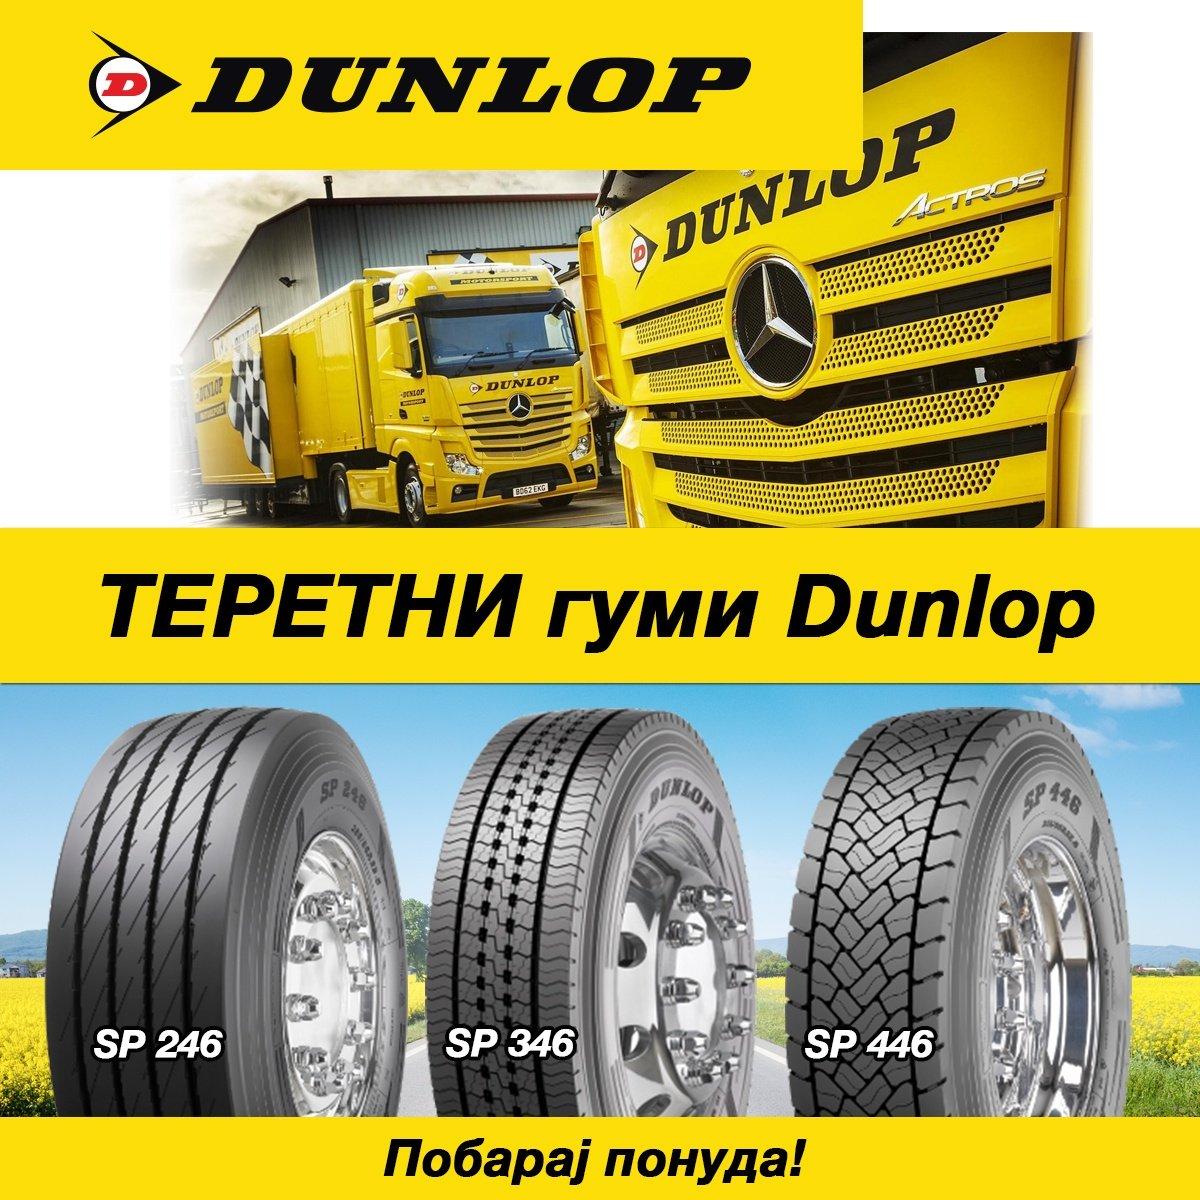 Dunlop teretni gumi